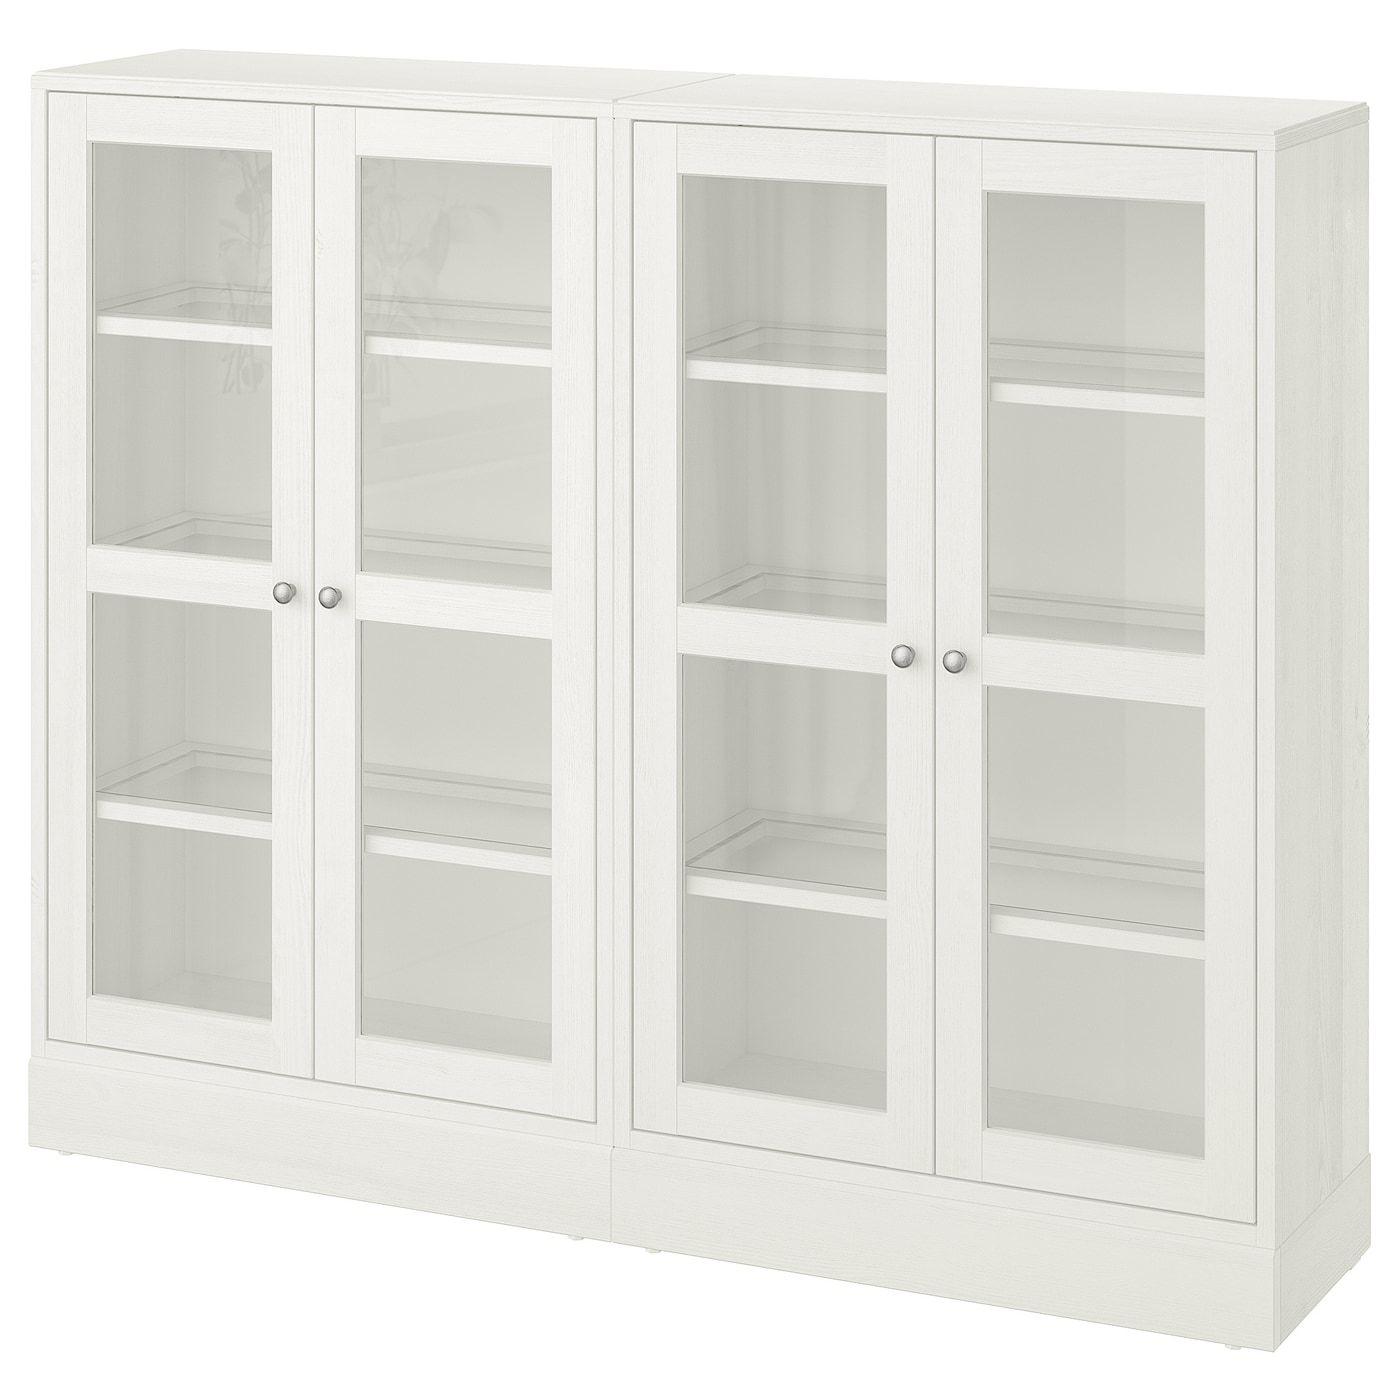 Porte Laque Blanc Ikea havsta storage combination w/glass doors - white | ikea